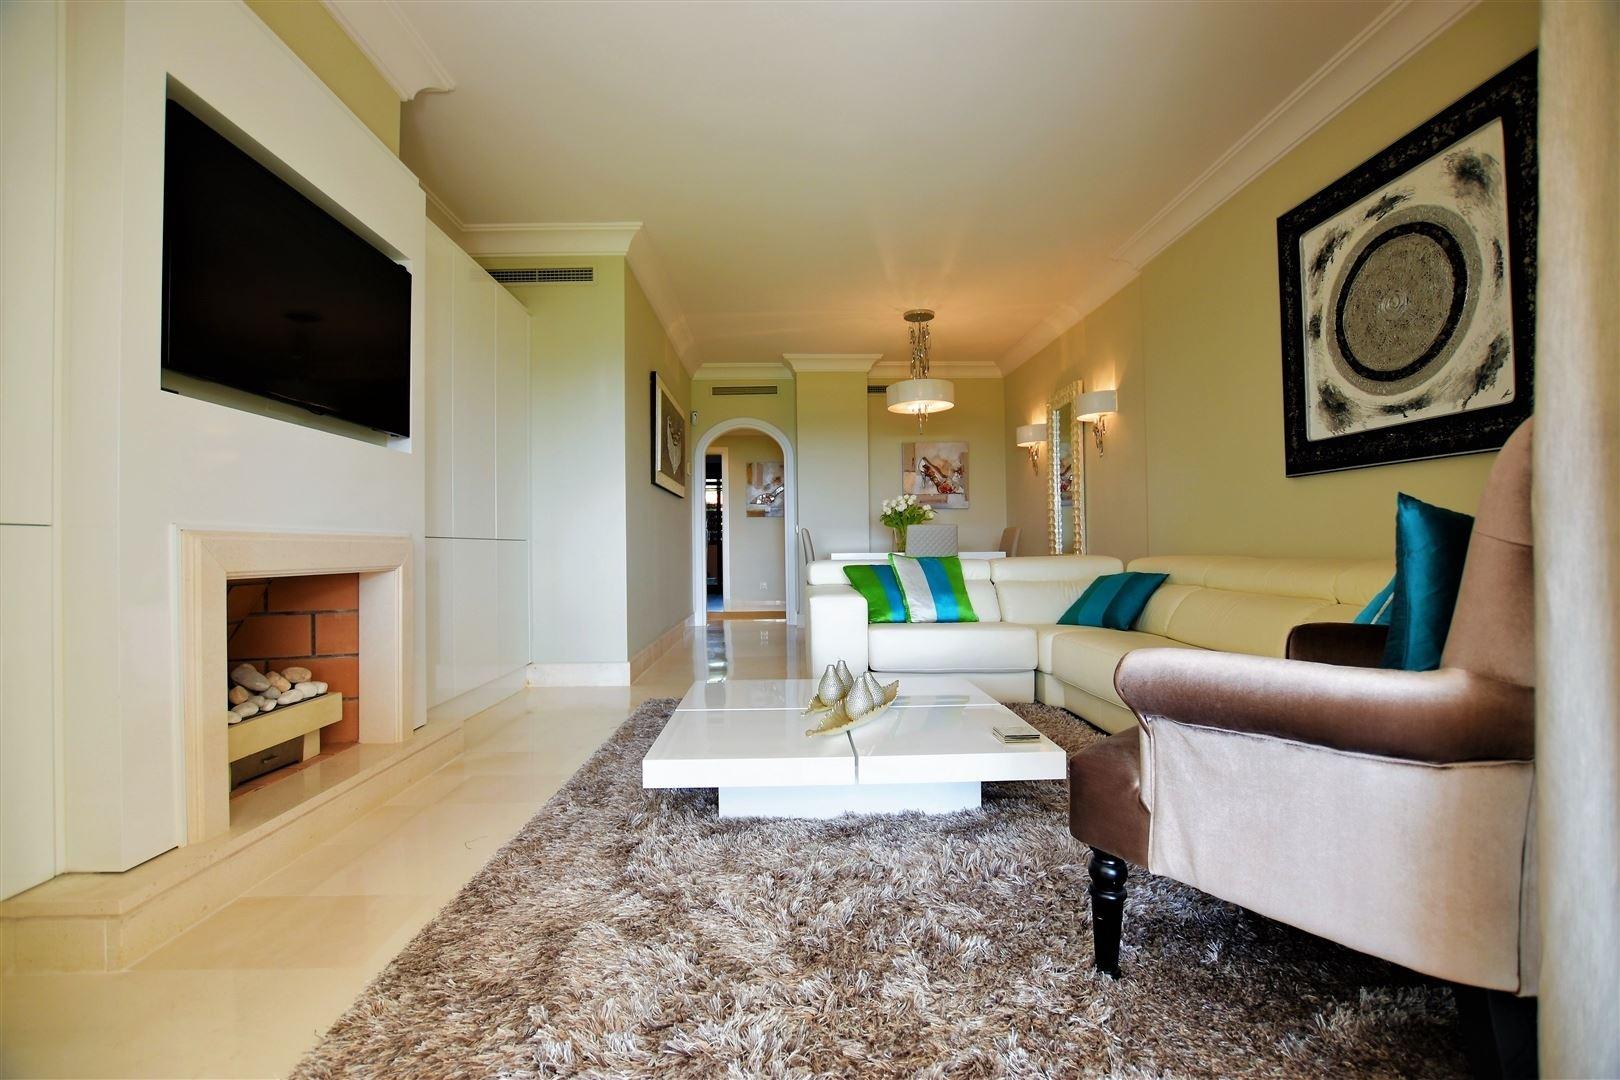 Foto 7 : Appartement te 29679 MARBELLA (Spanje) - Prijs € 1.750